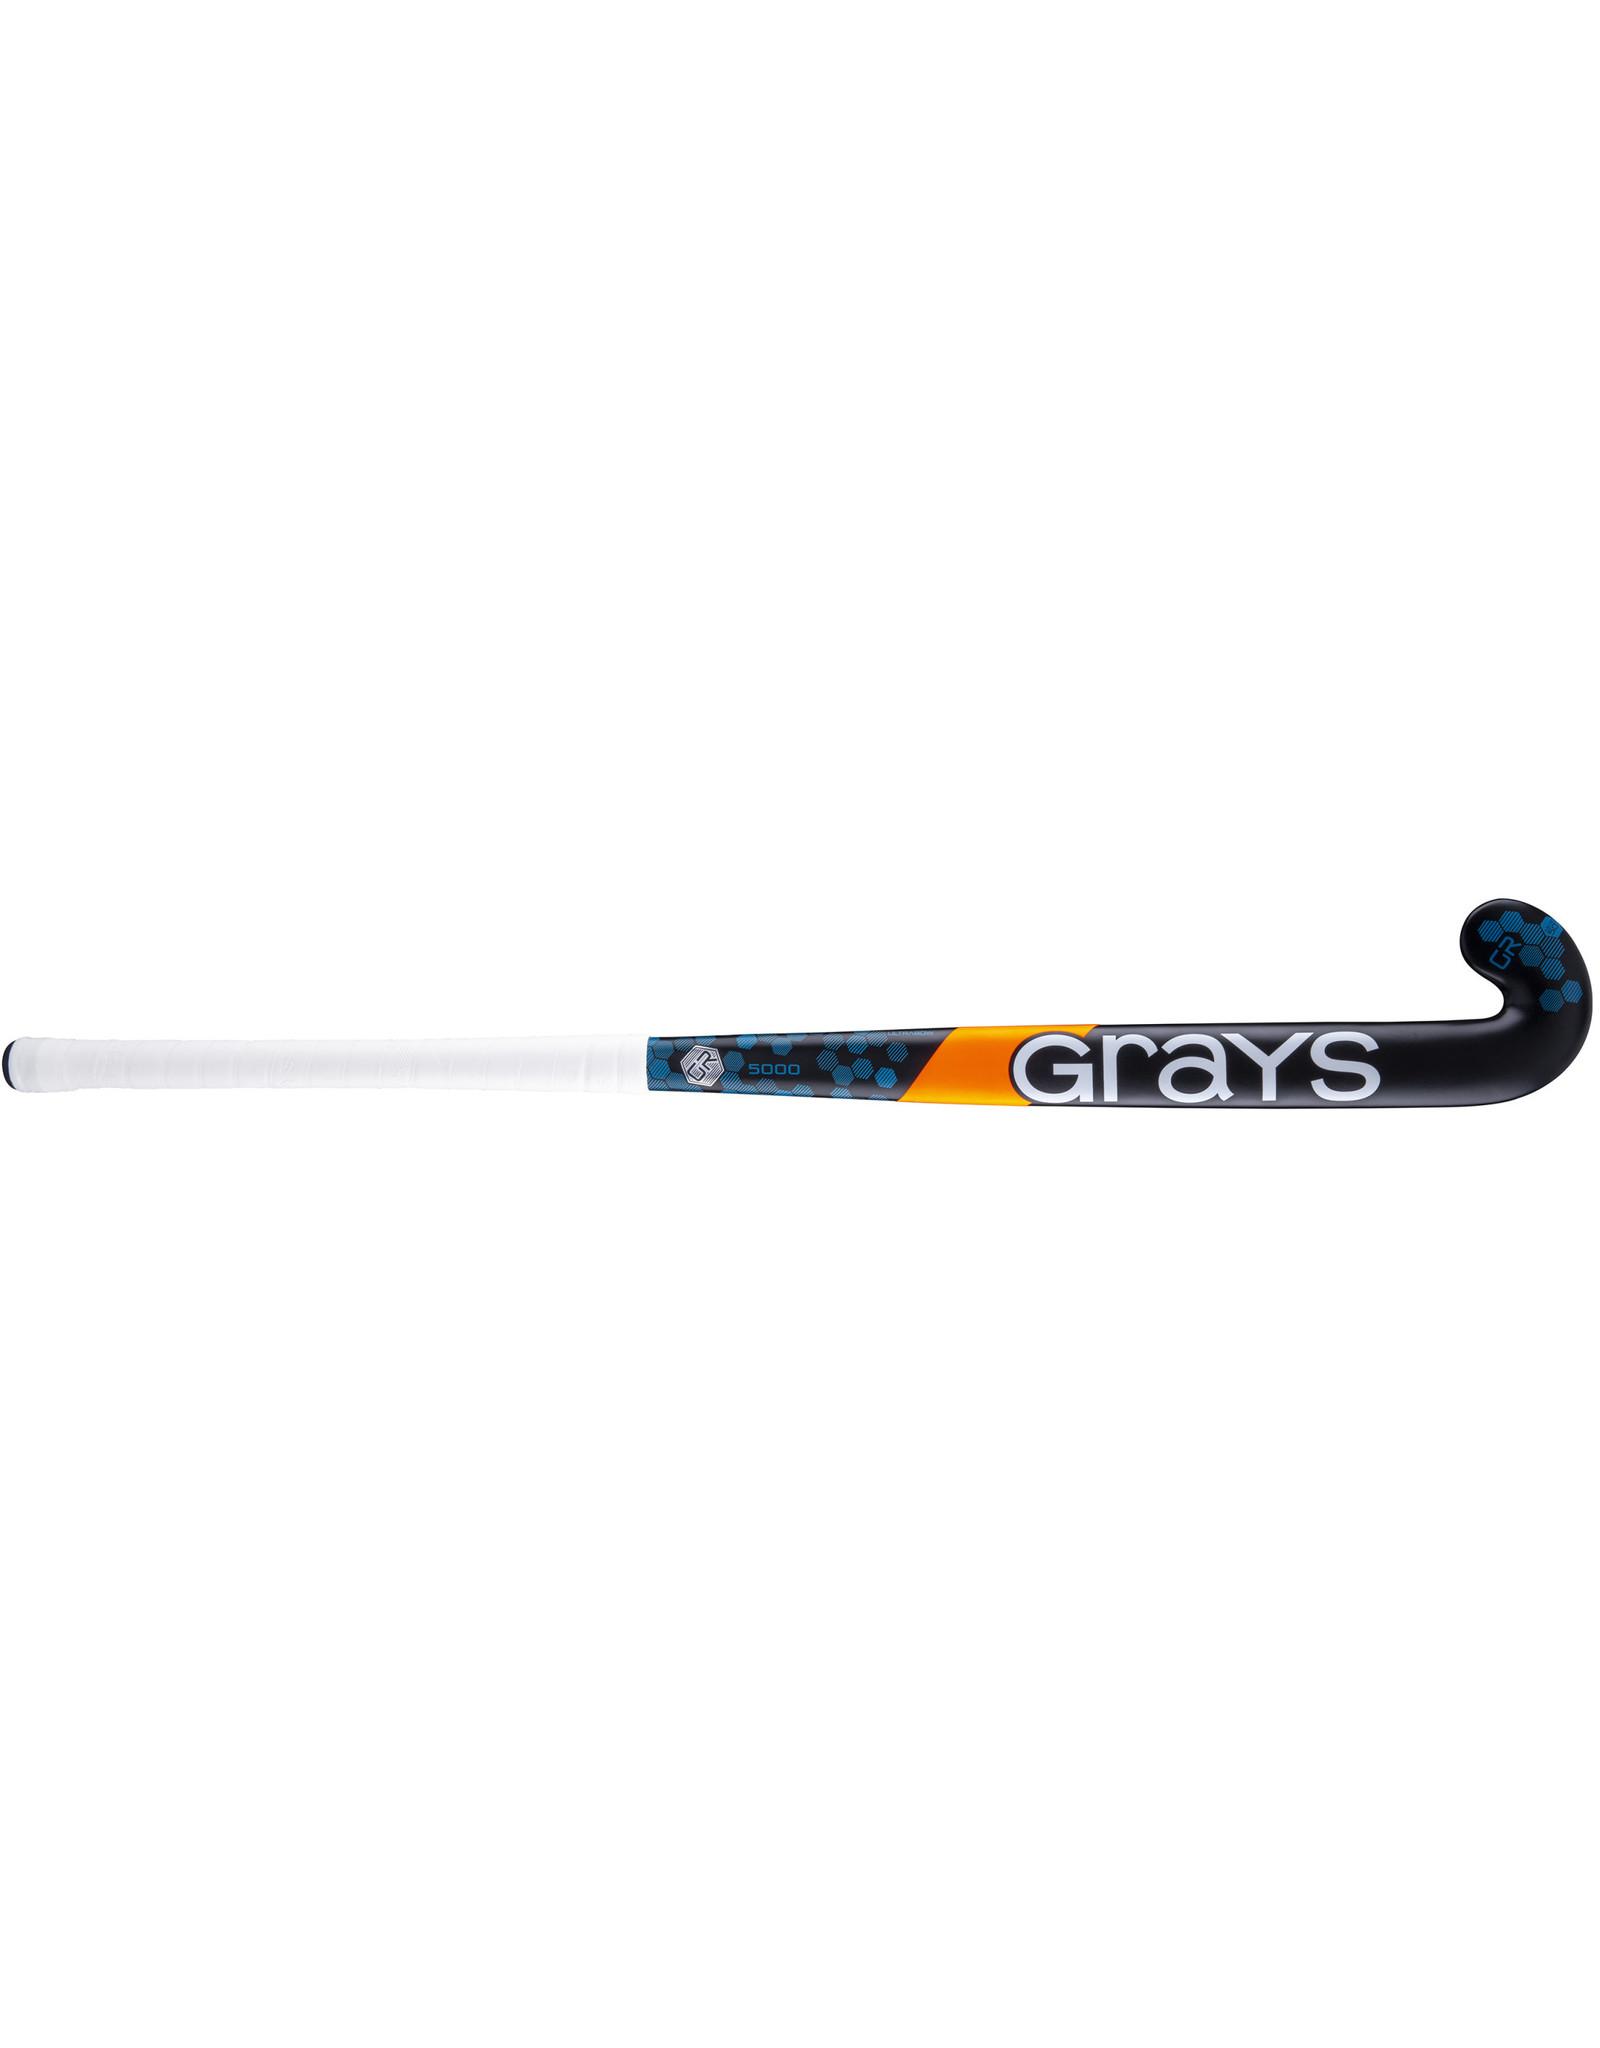 Grays STK GR5000 UB MC